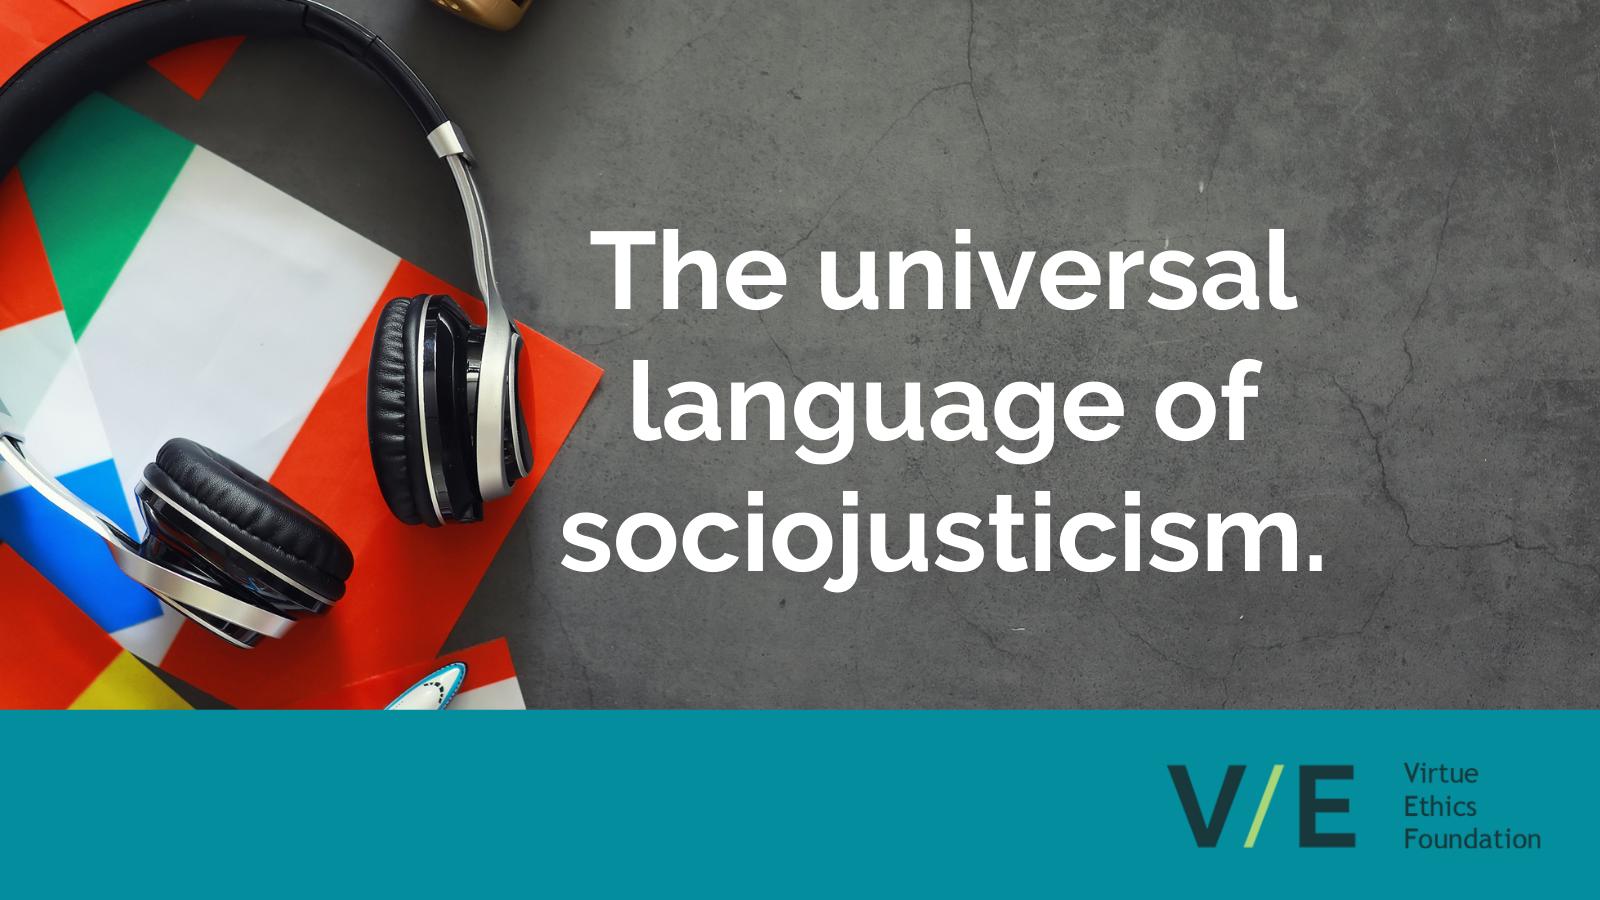 The universal language of sociojusticism